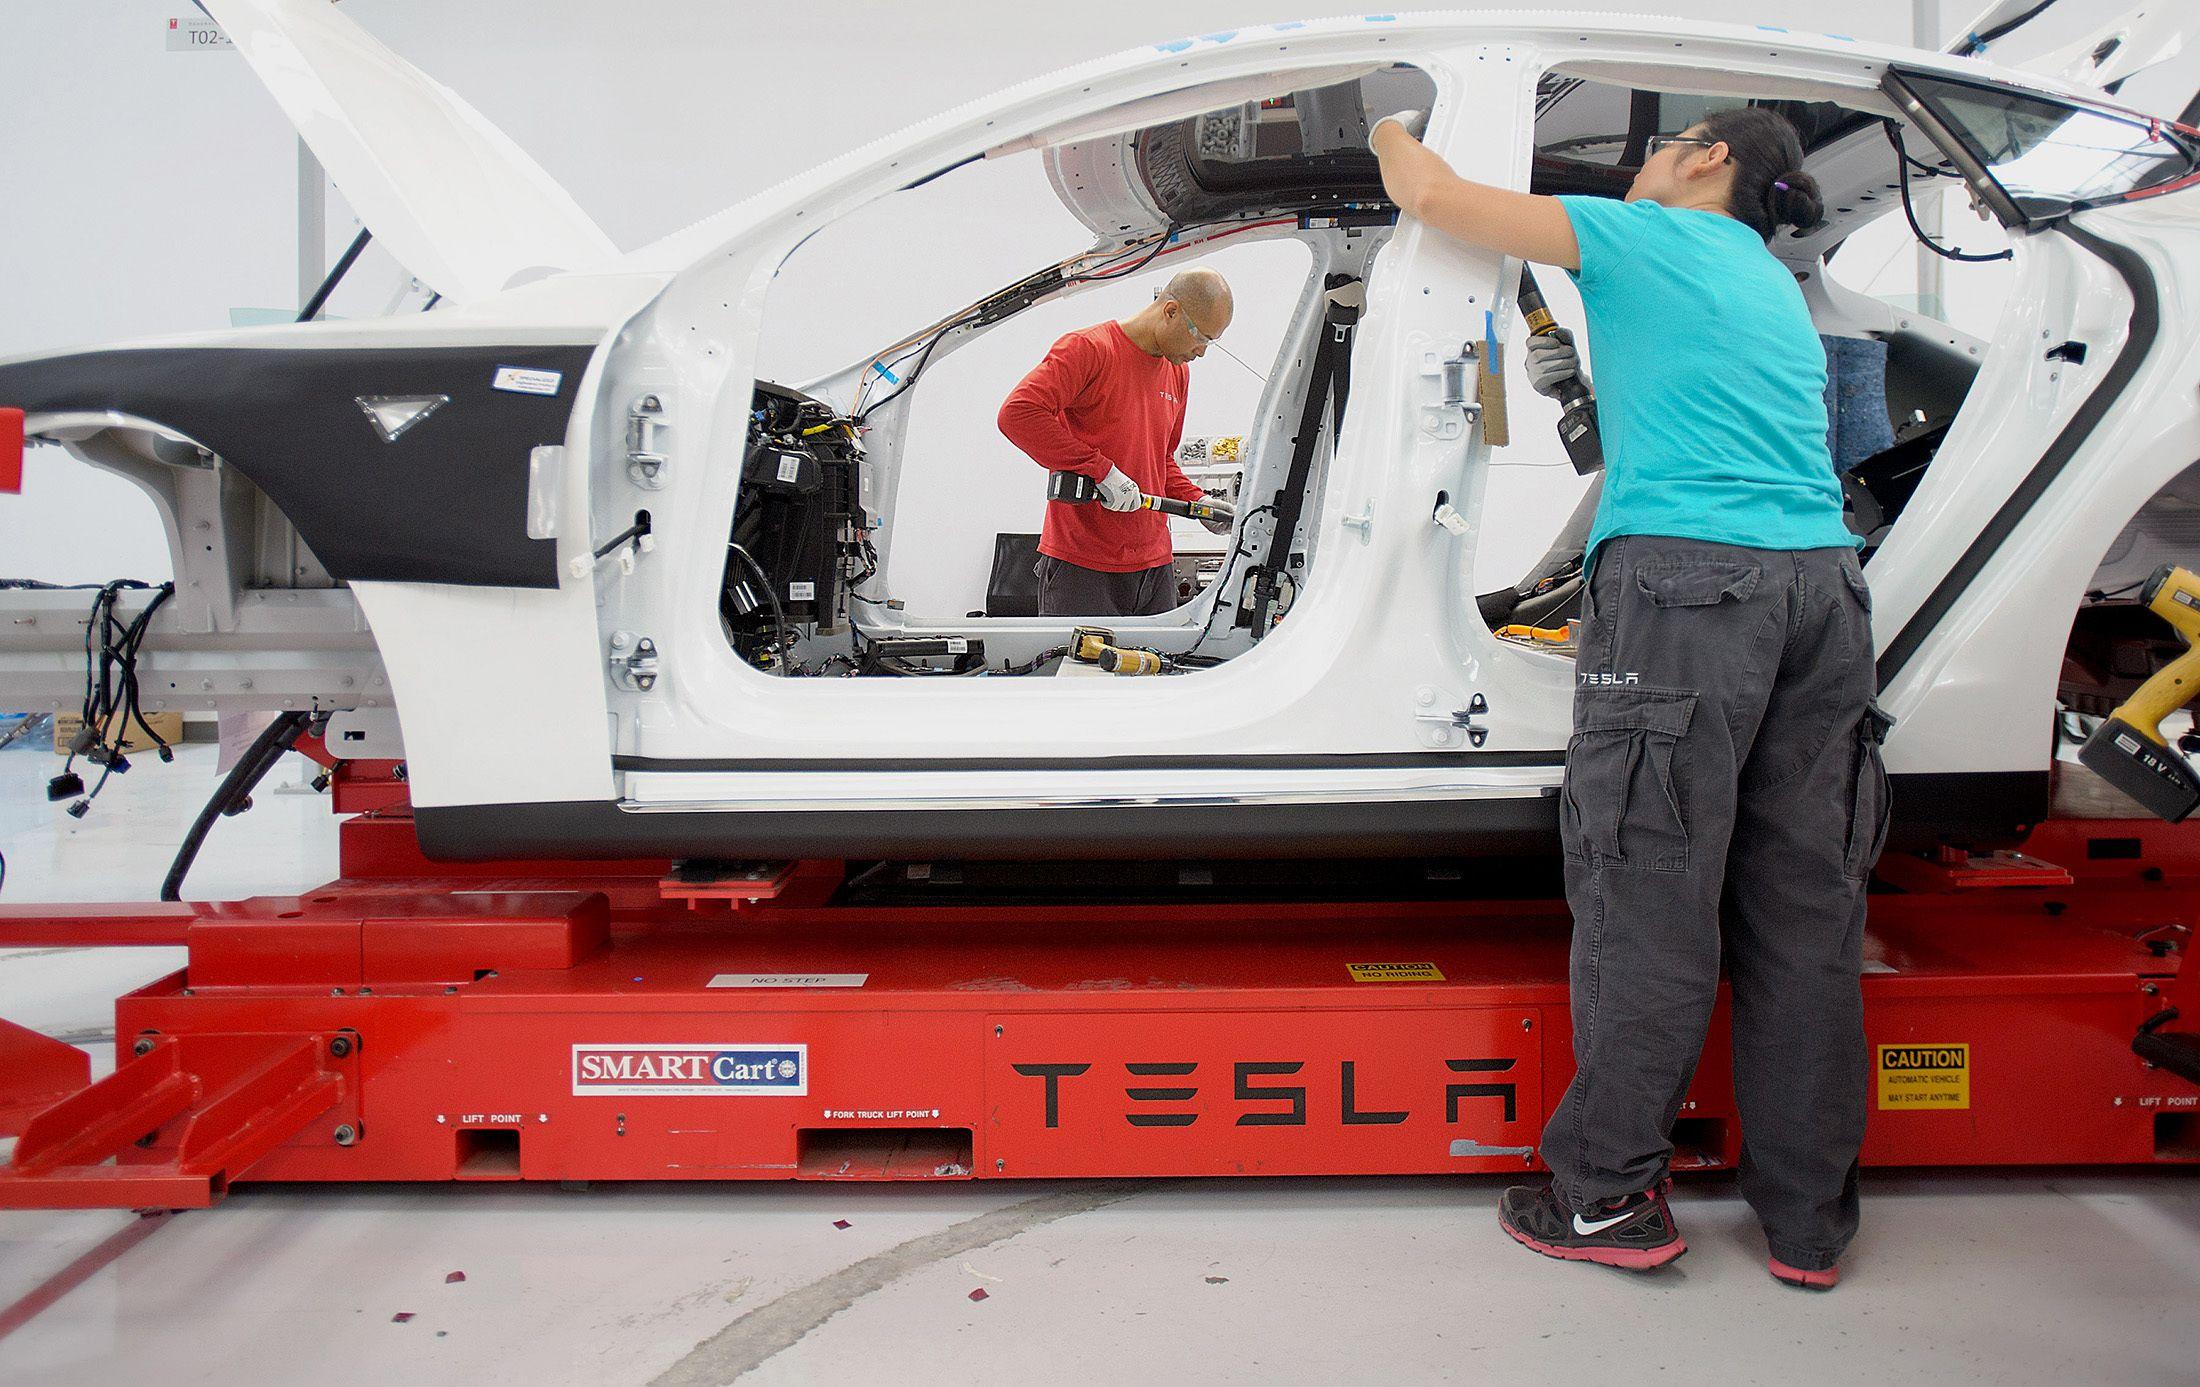 SupremeCapitalGroup on Tesla electric car, Innovation